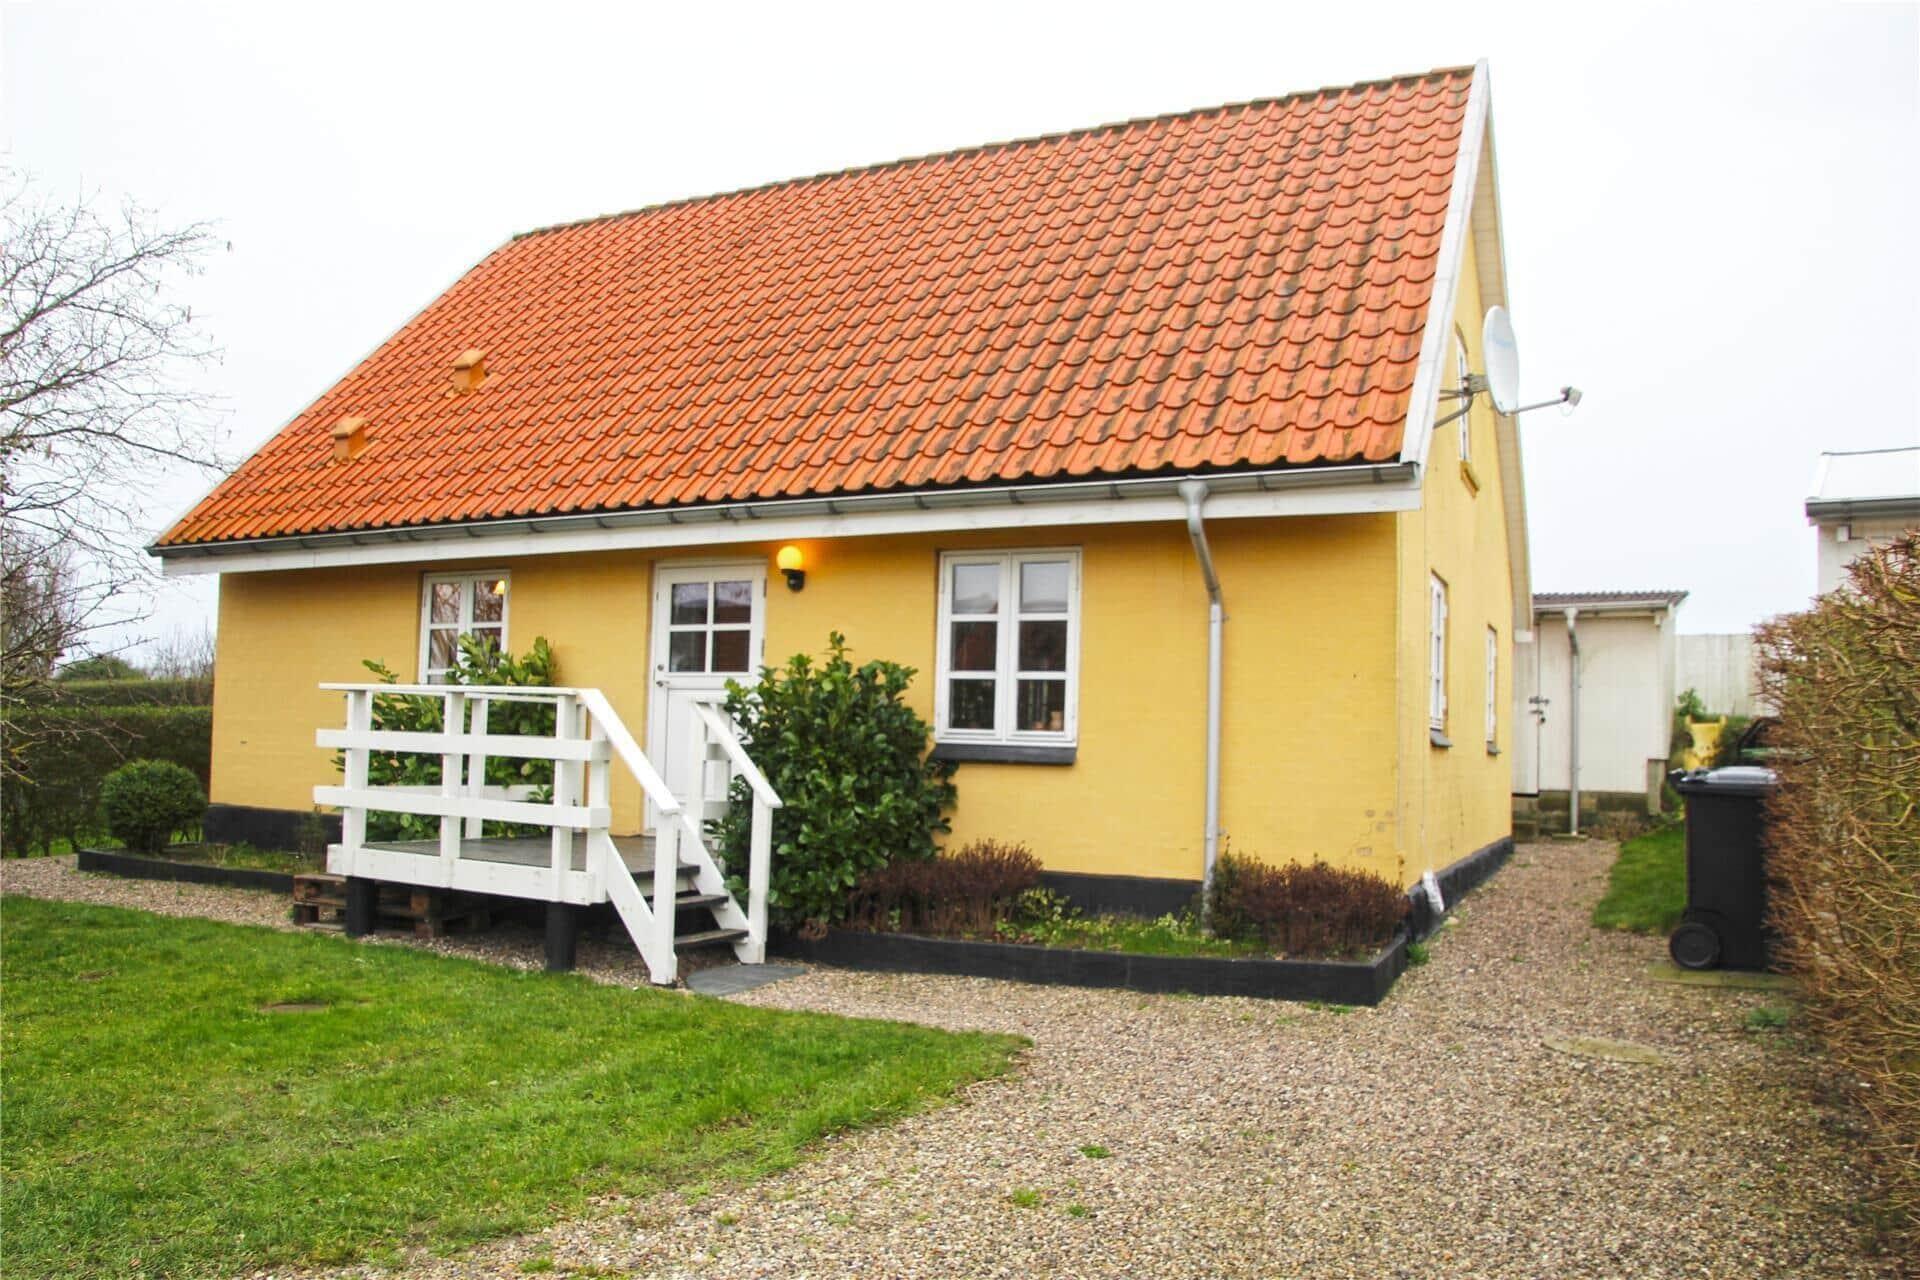 Bild 1-3 Ferienhaus M66858, Fynshovedvej 344, DK - 5380 Dalby